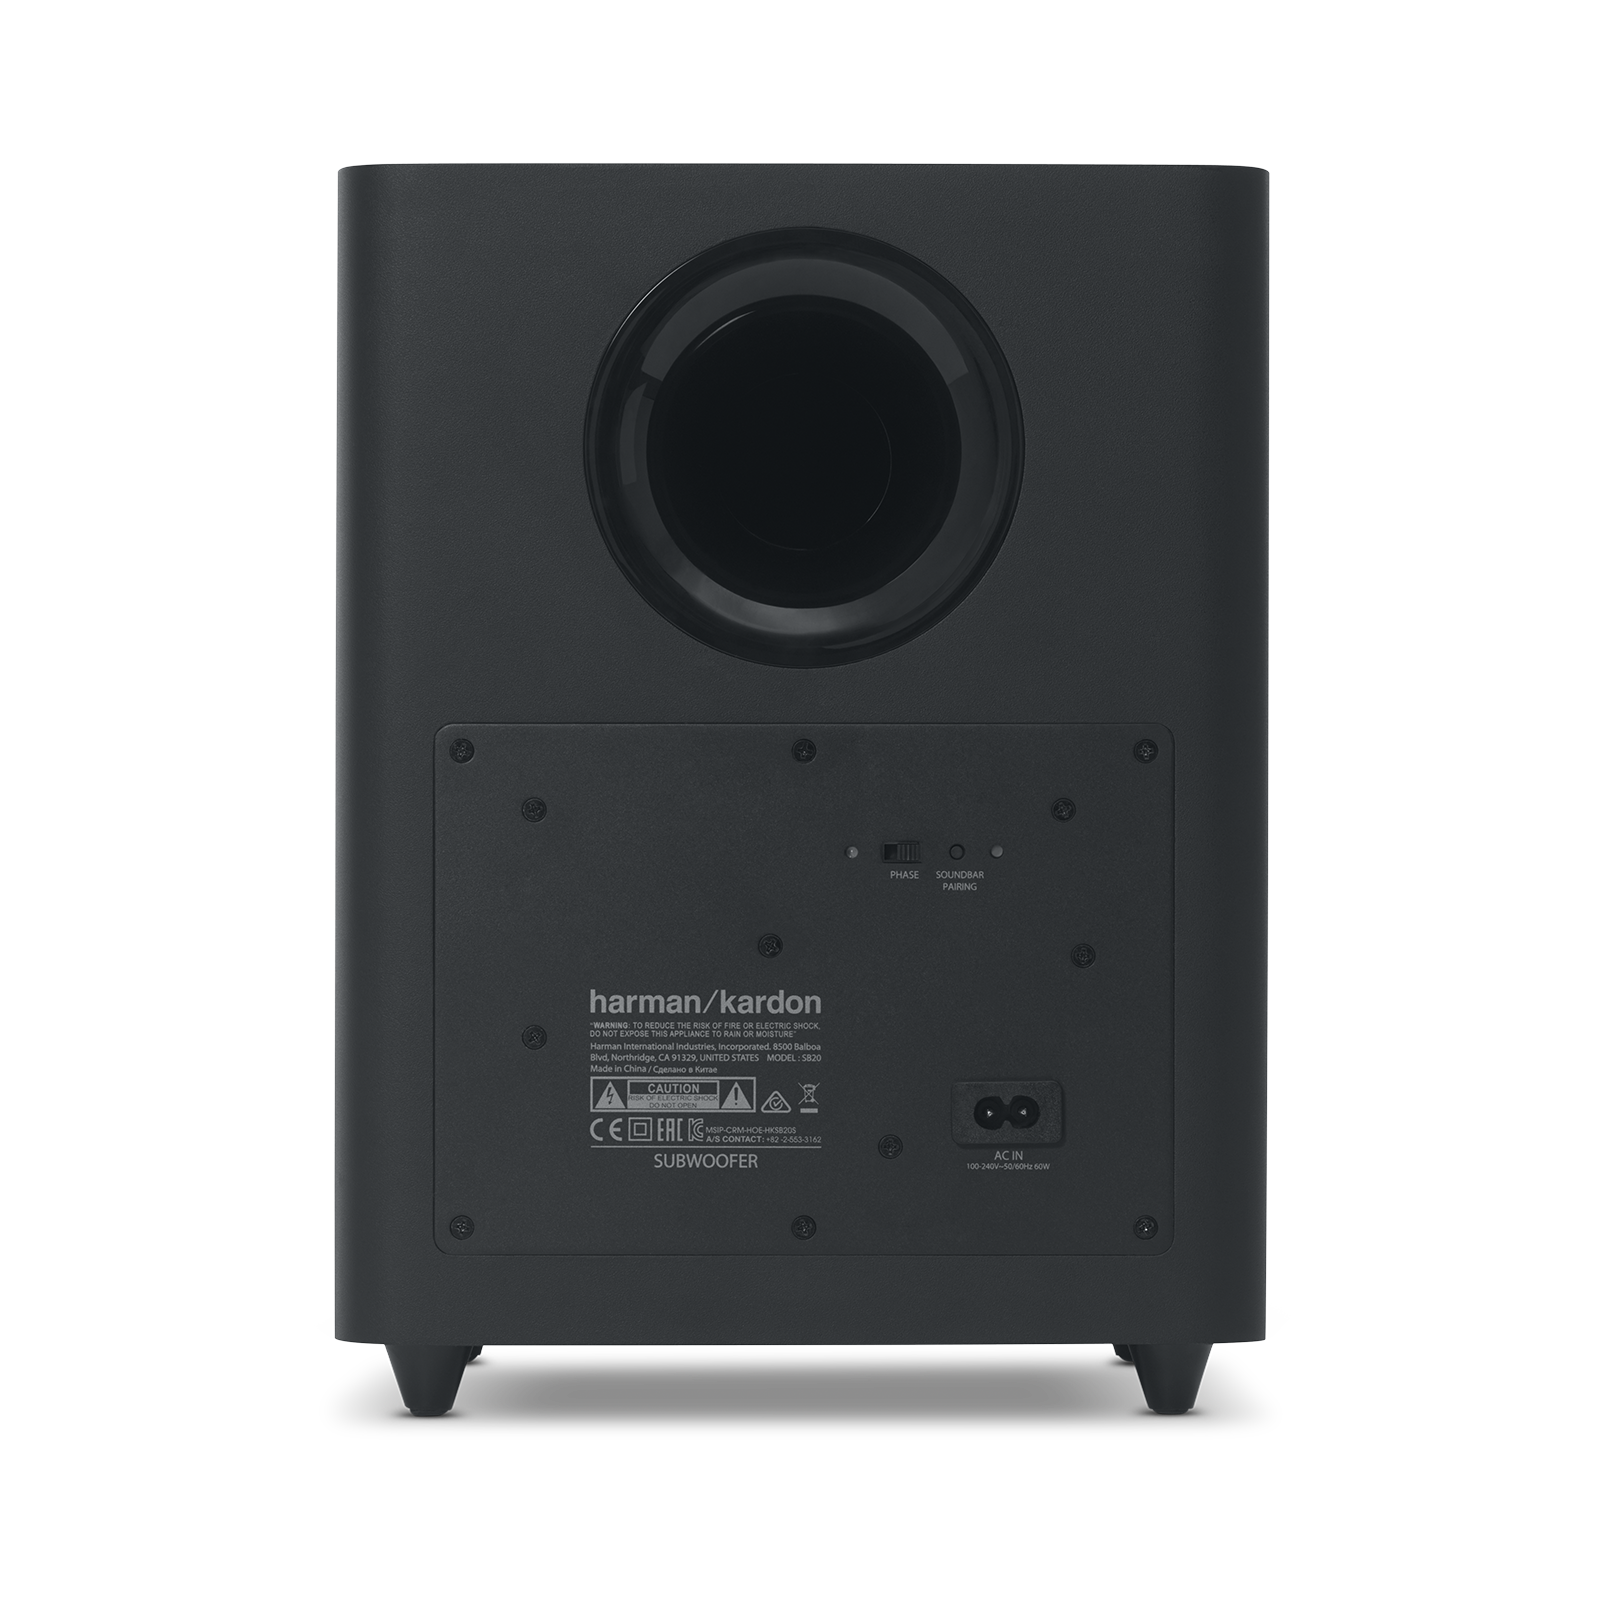 HK SB20 - Black - Advanced soundbar with Bluetooth and powerful wireless subwoofer - Detailshot 5